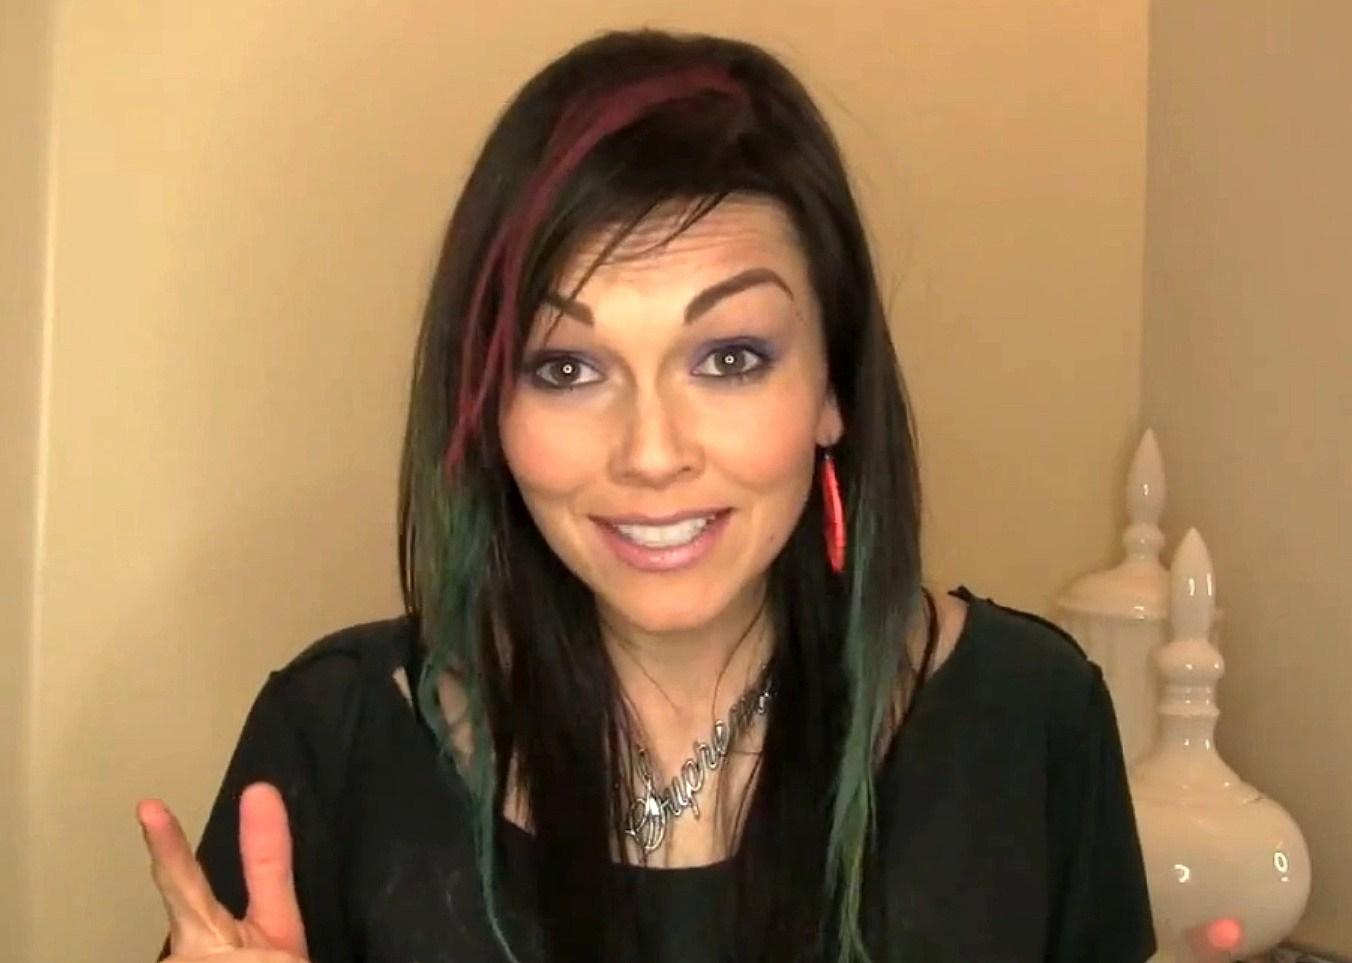 Chalk Dye Your Hair